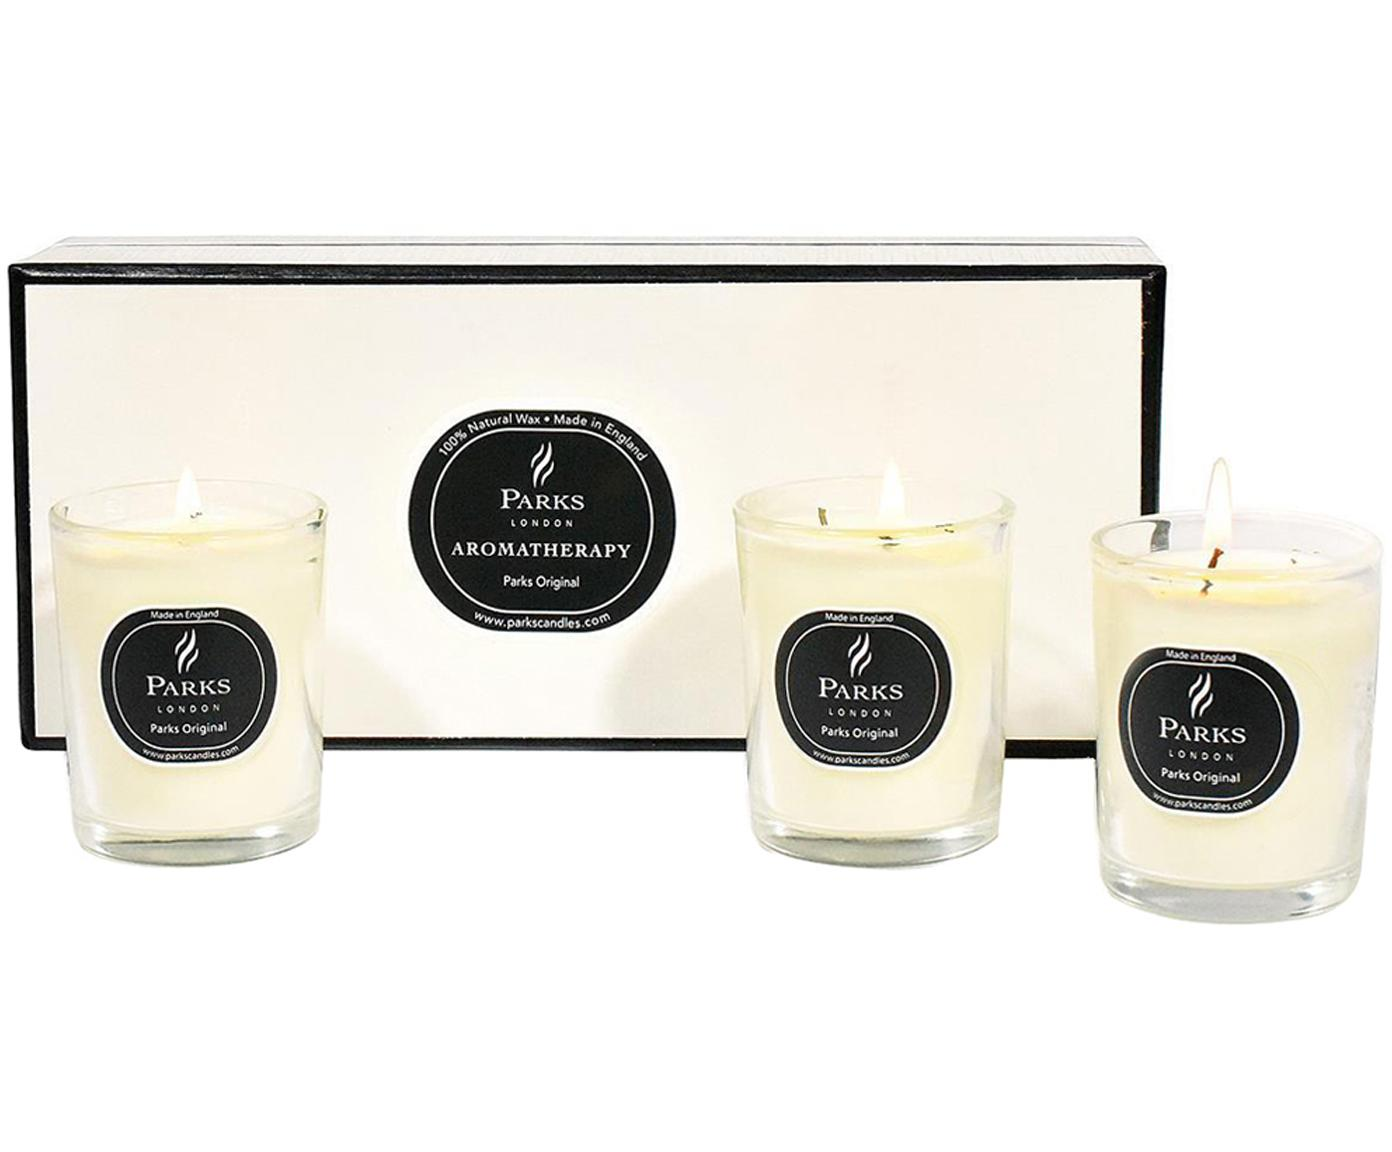 Geurkaarsen Parks Original (vanille & citrus), 3 stuks, Houder: glas, Transparant, wit, zwart, Ø 5 x H 5 cm